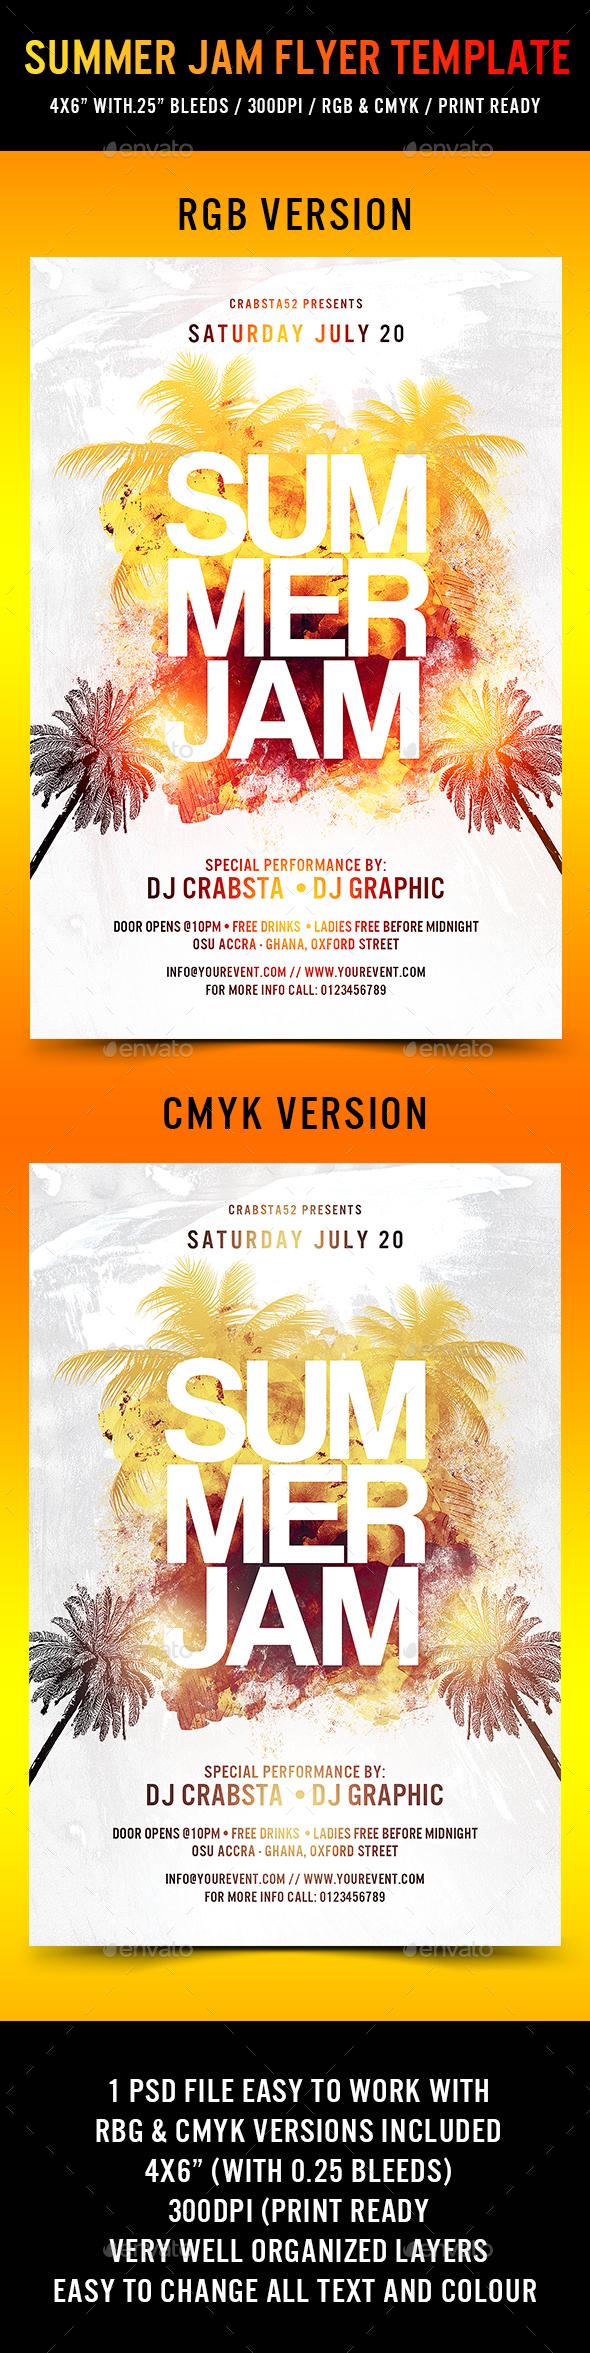 Summer Jam Flyer Template - Events Flyers